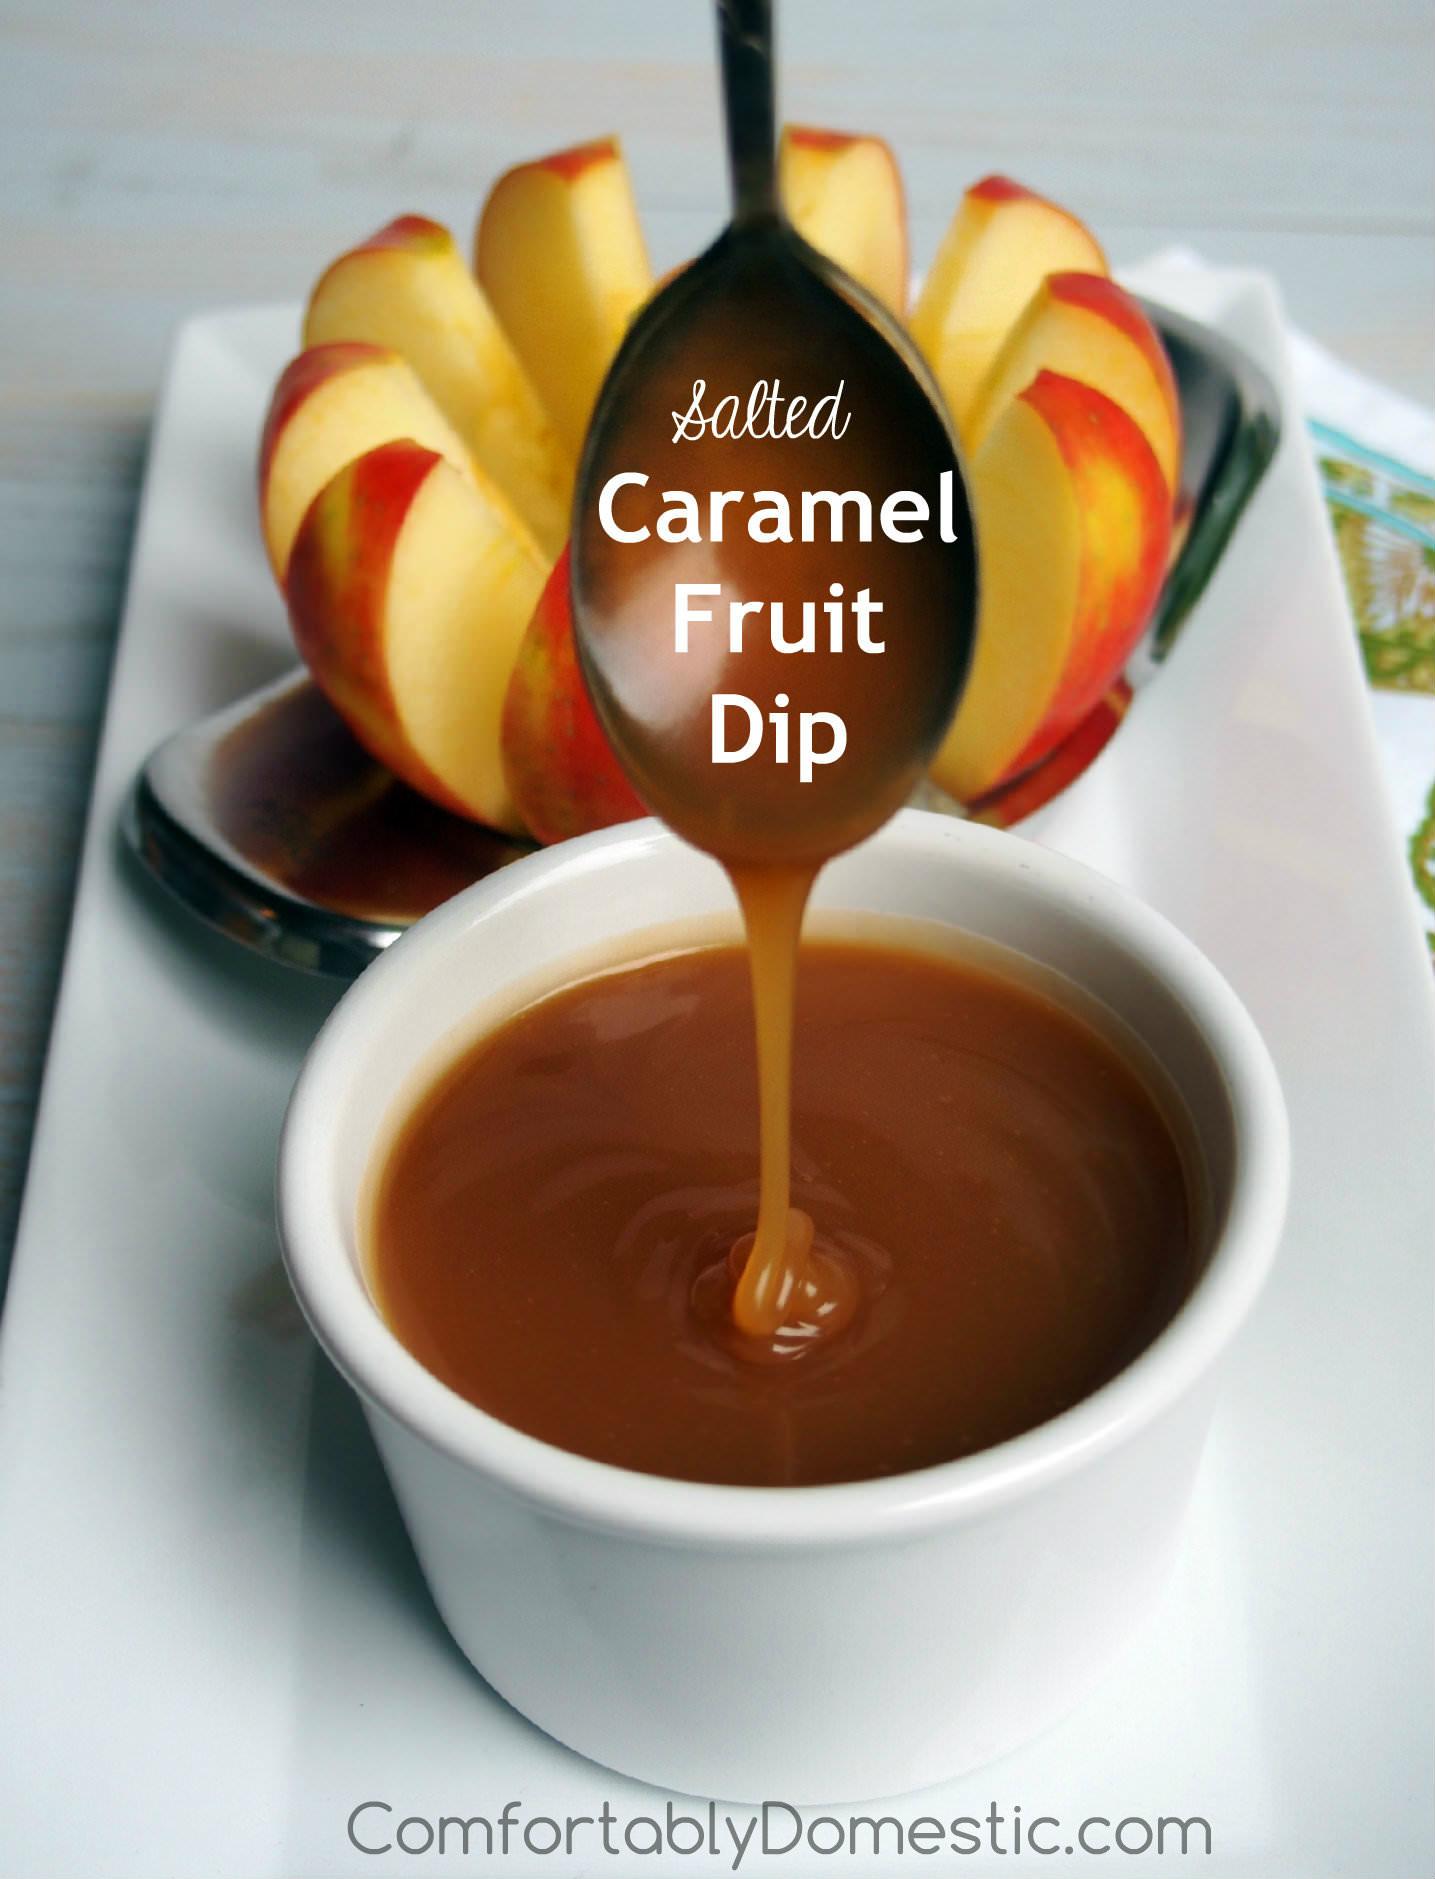 Salted Caramel Fruit Dip | ComfortablyDomestic.com